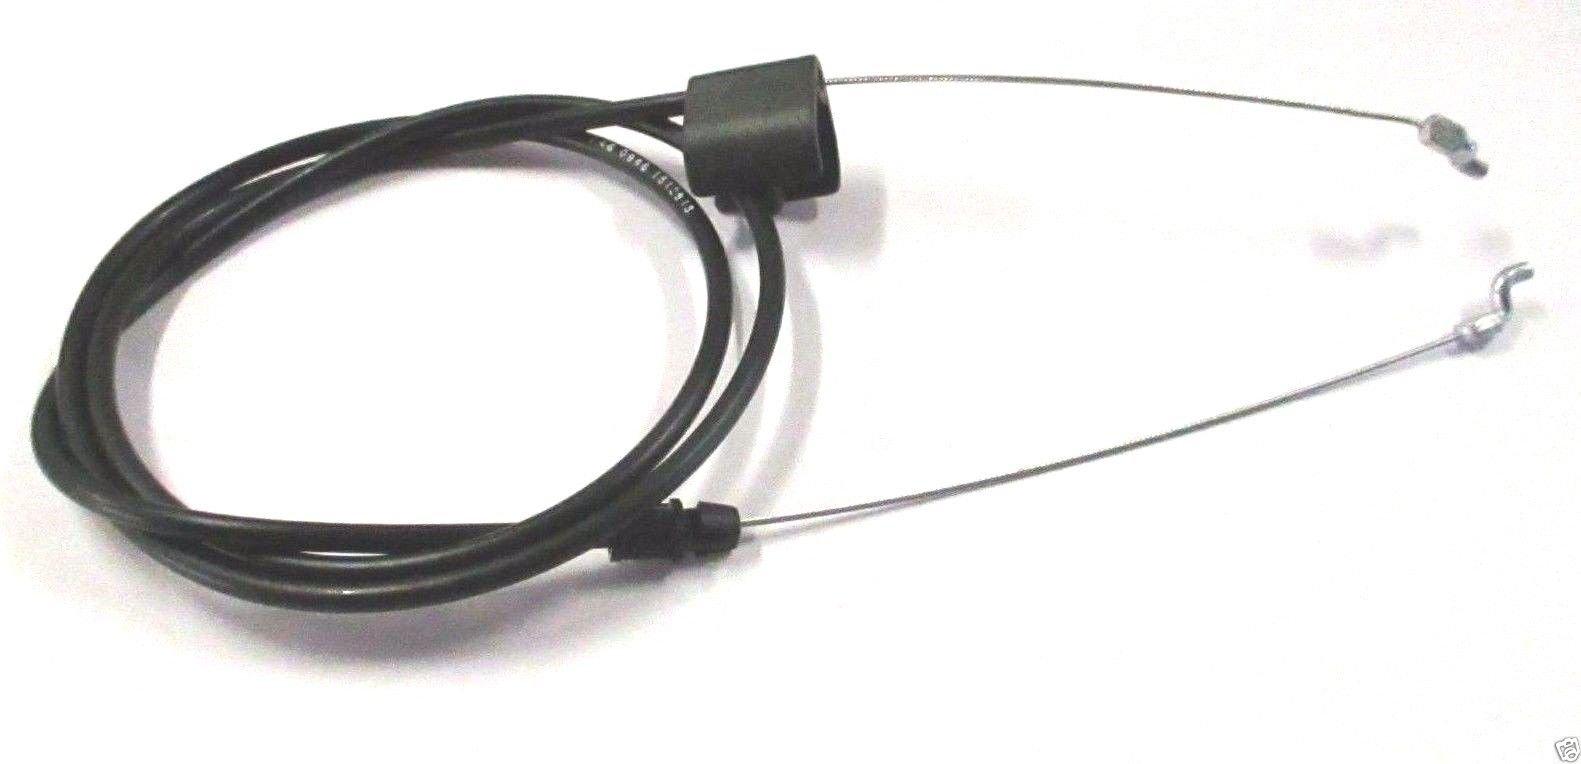 Mtd 946-0946 Lawn Mower Zone Control Cable Genuine Original Equipment Manufacturer (OEM) Part